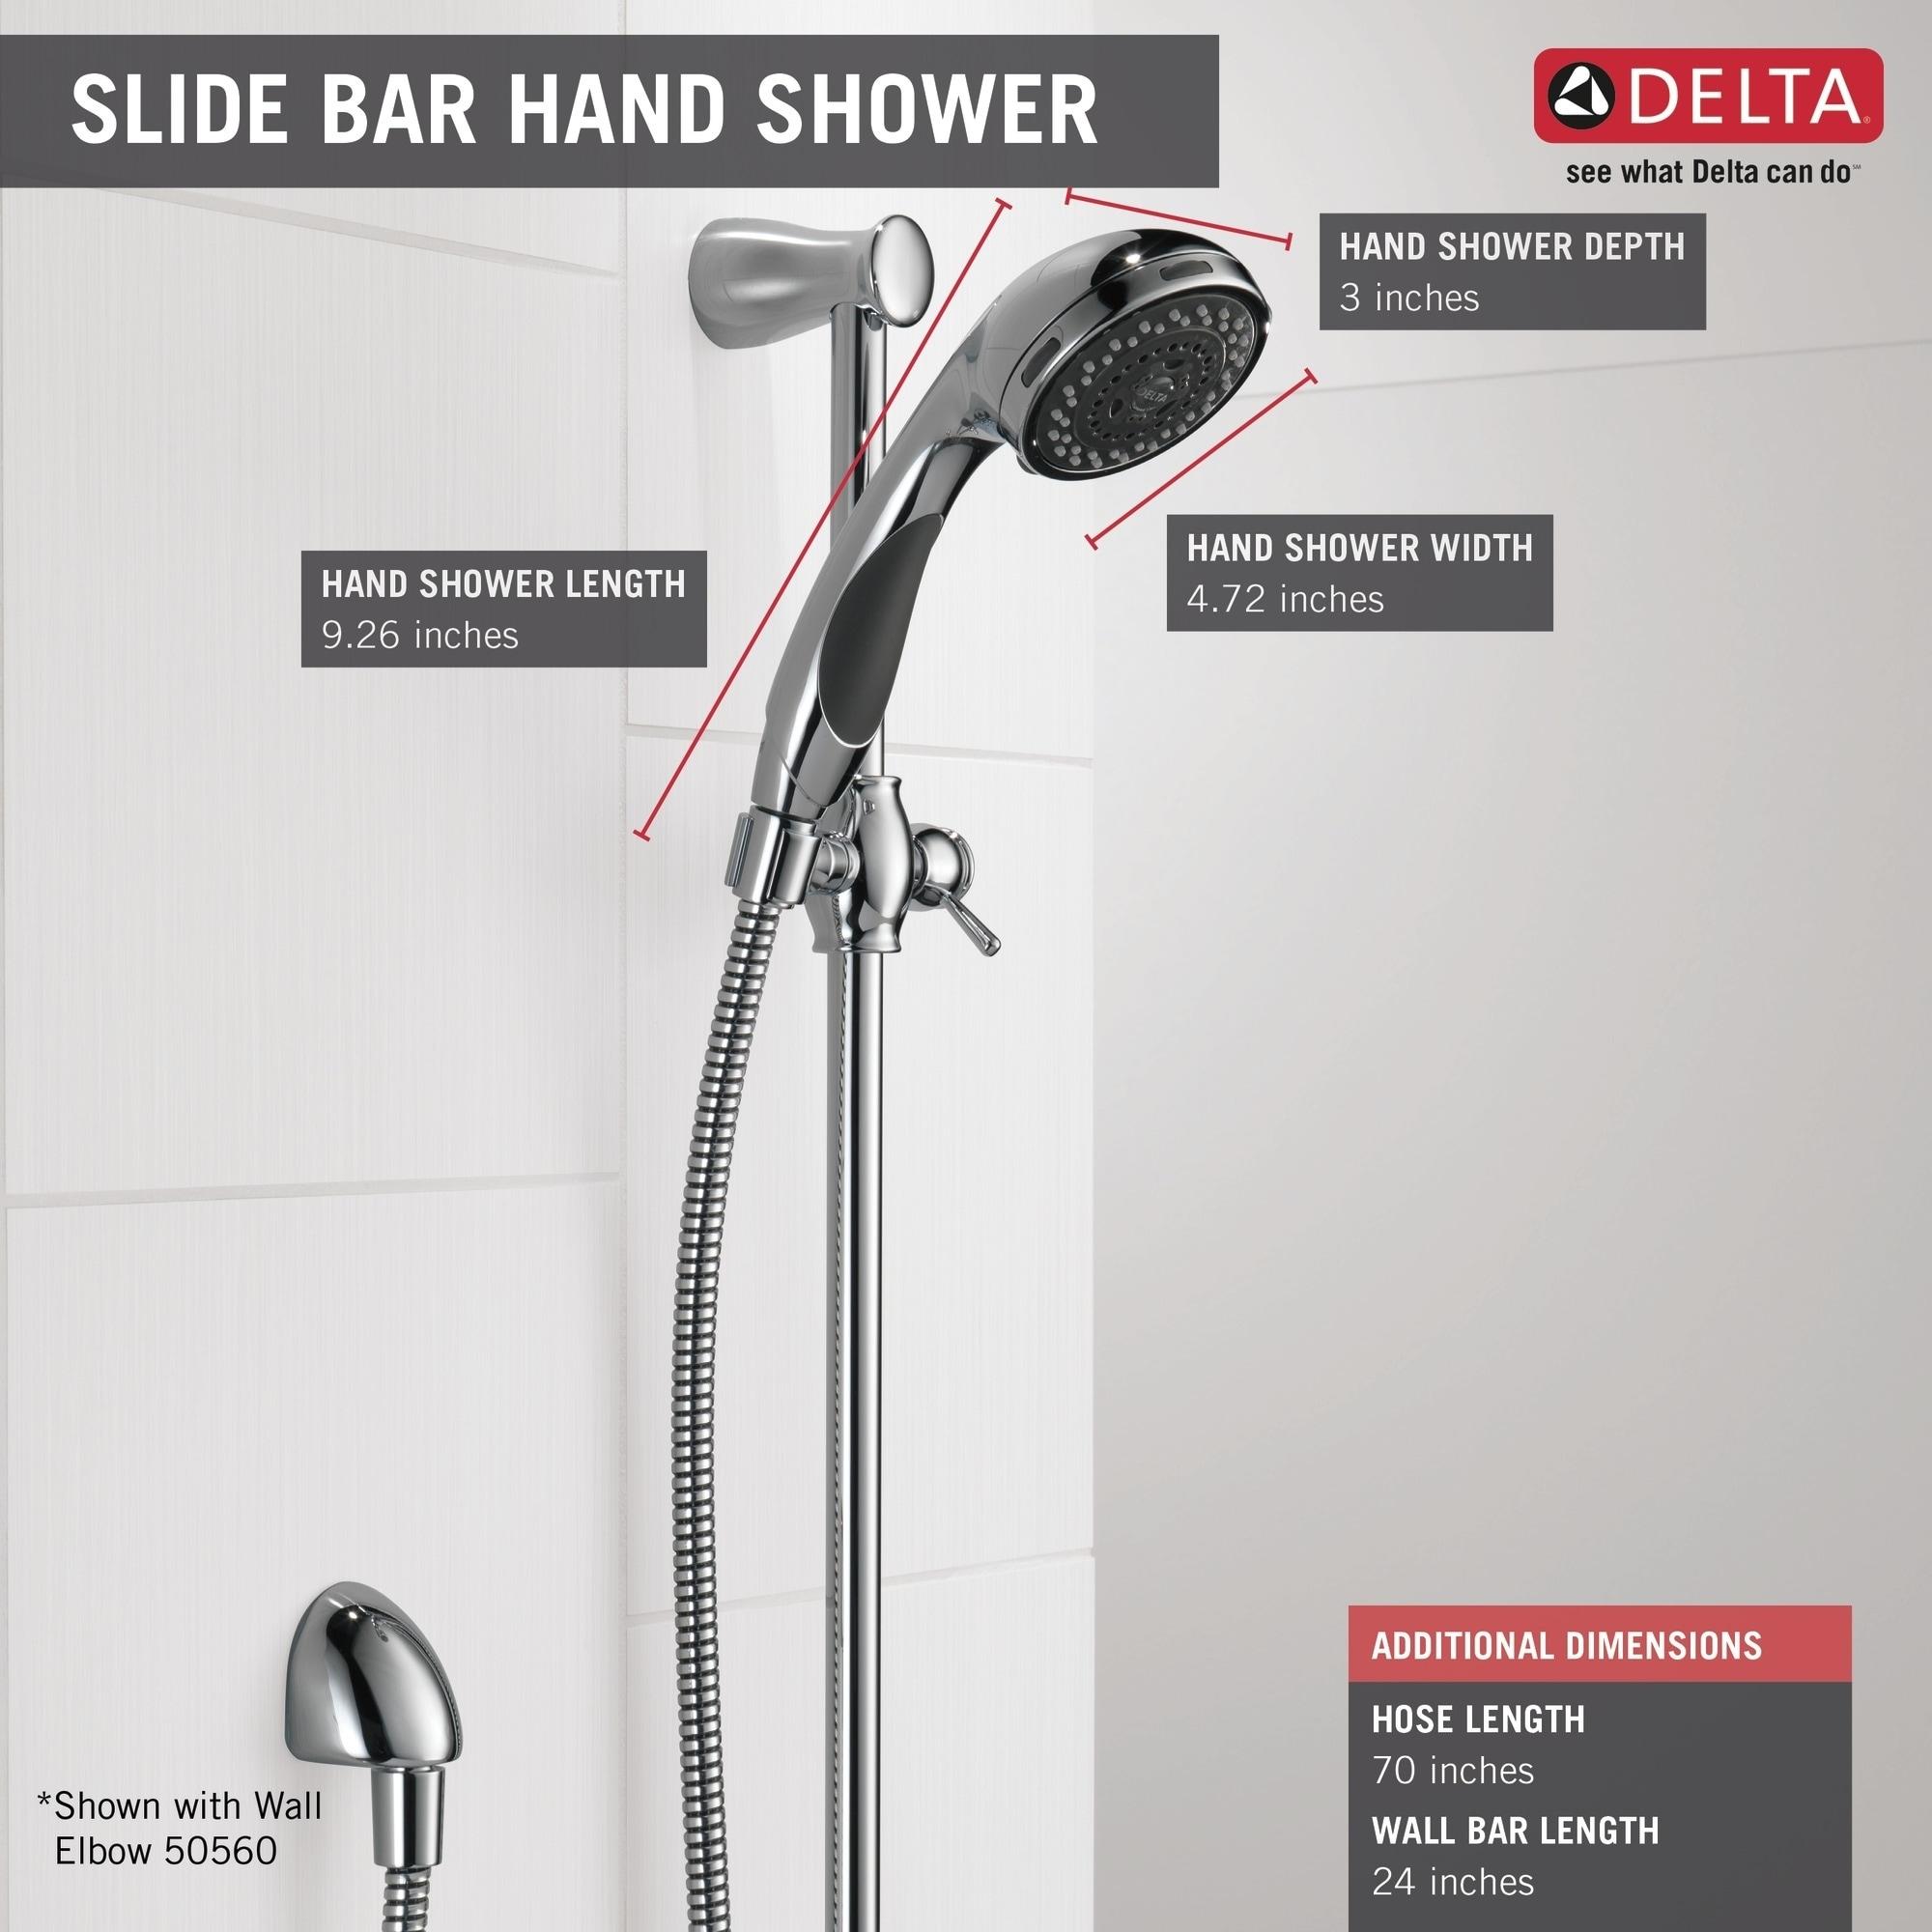 Shower Kit Wall Bar Shower 1.75 GPM Oil Rubbed Bronze 3-Spray Adjustable Slide